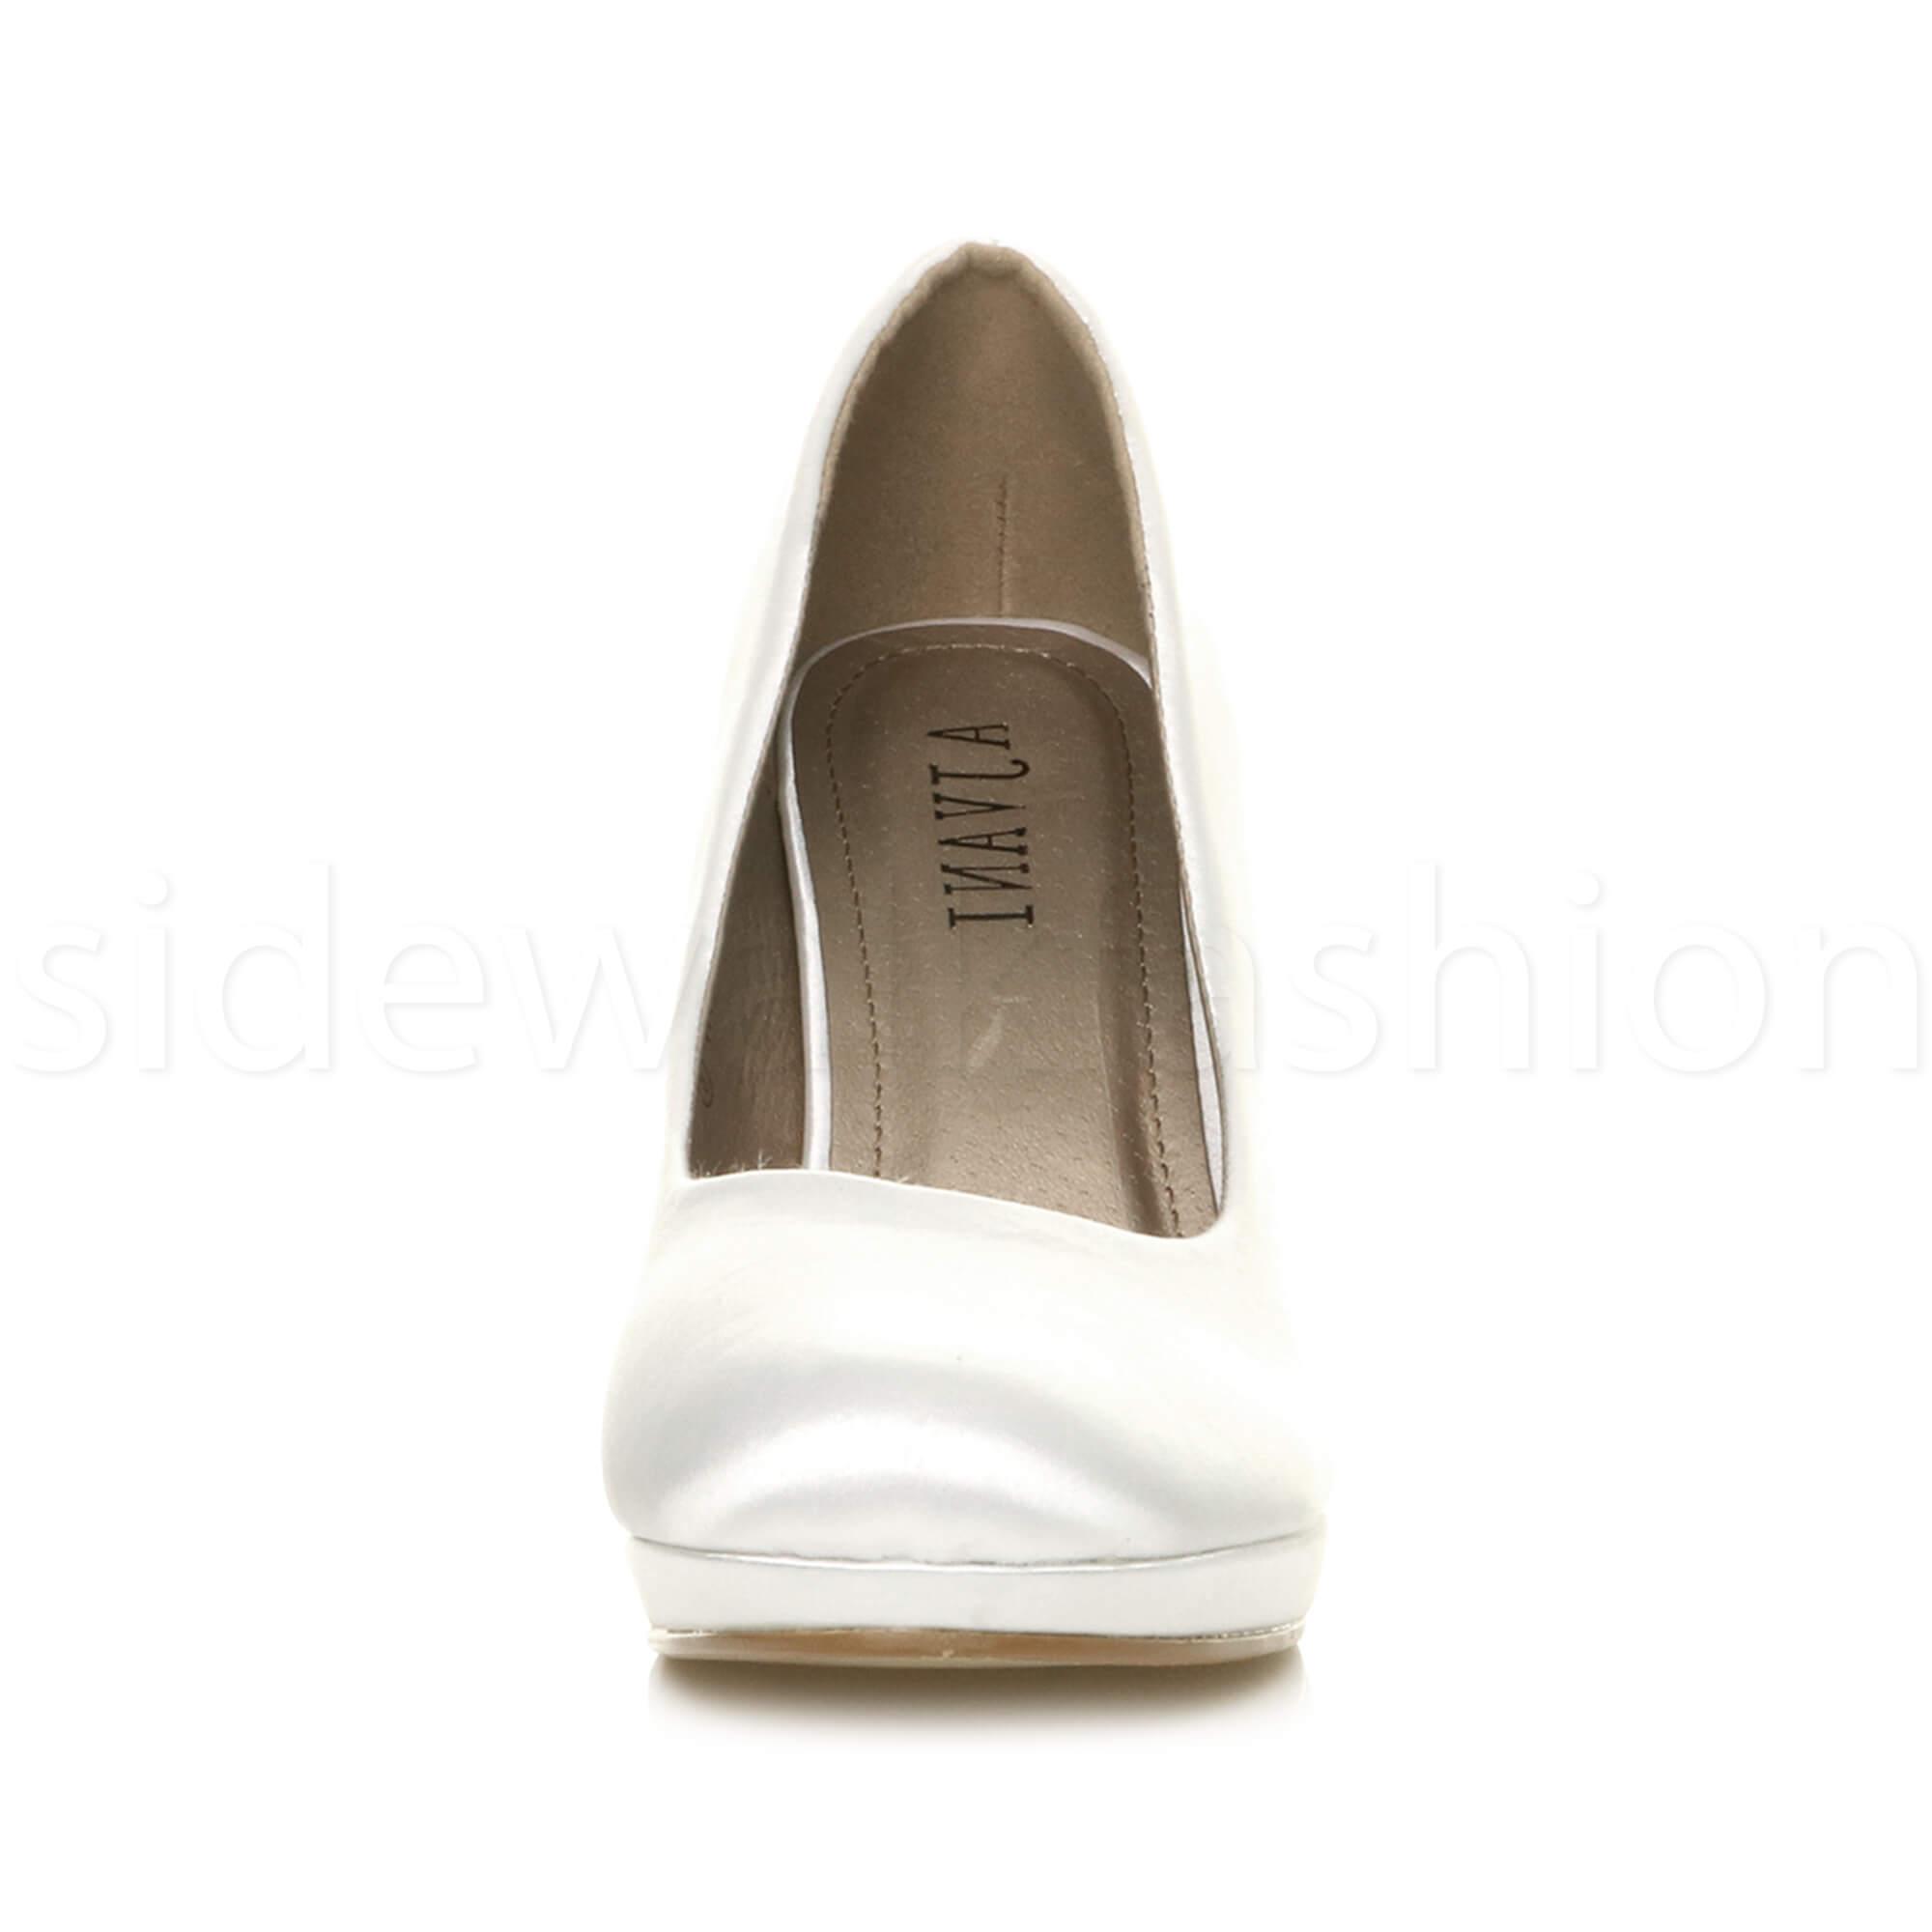 Womens-ladies-high-mid-heel-platform-wedding-evening-bridesmaid-court-shoes-size thumbnail 202